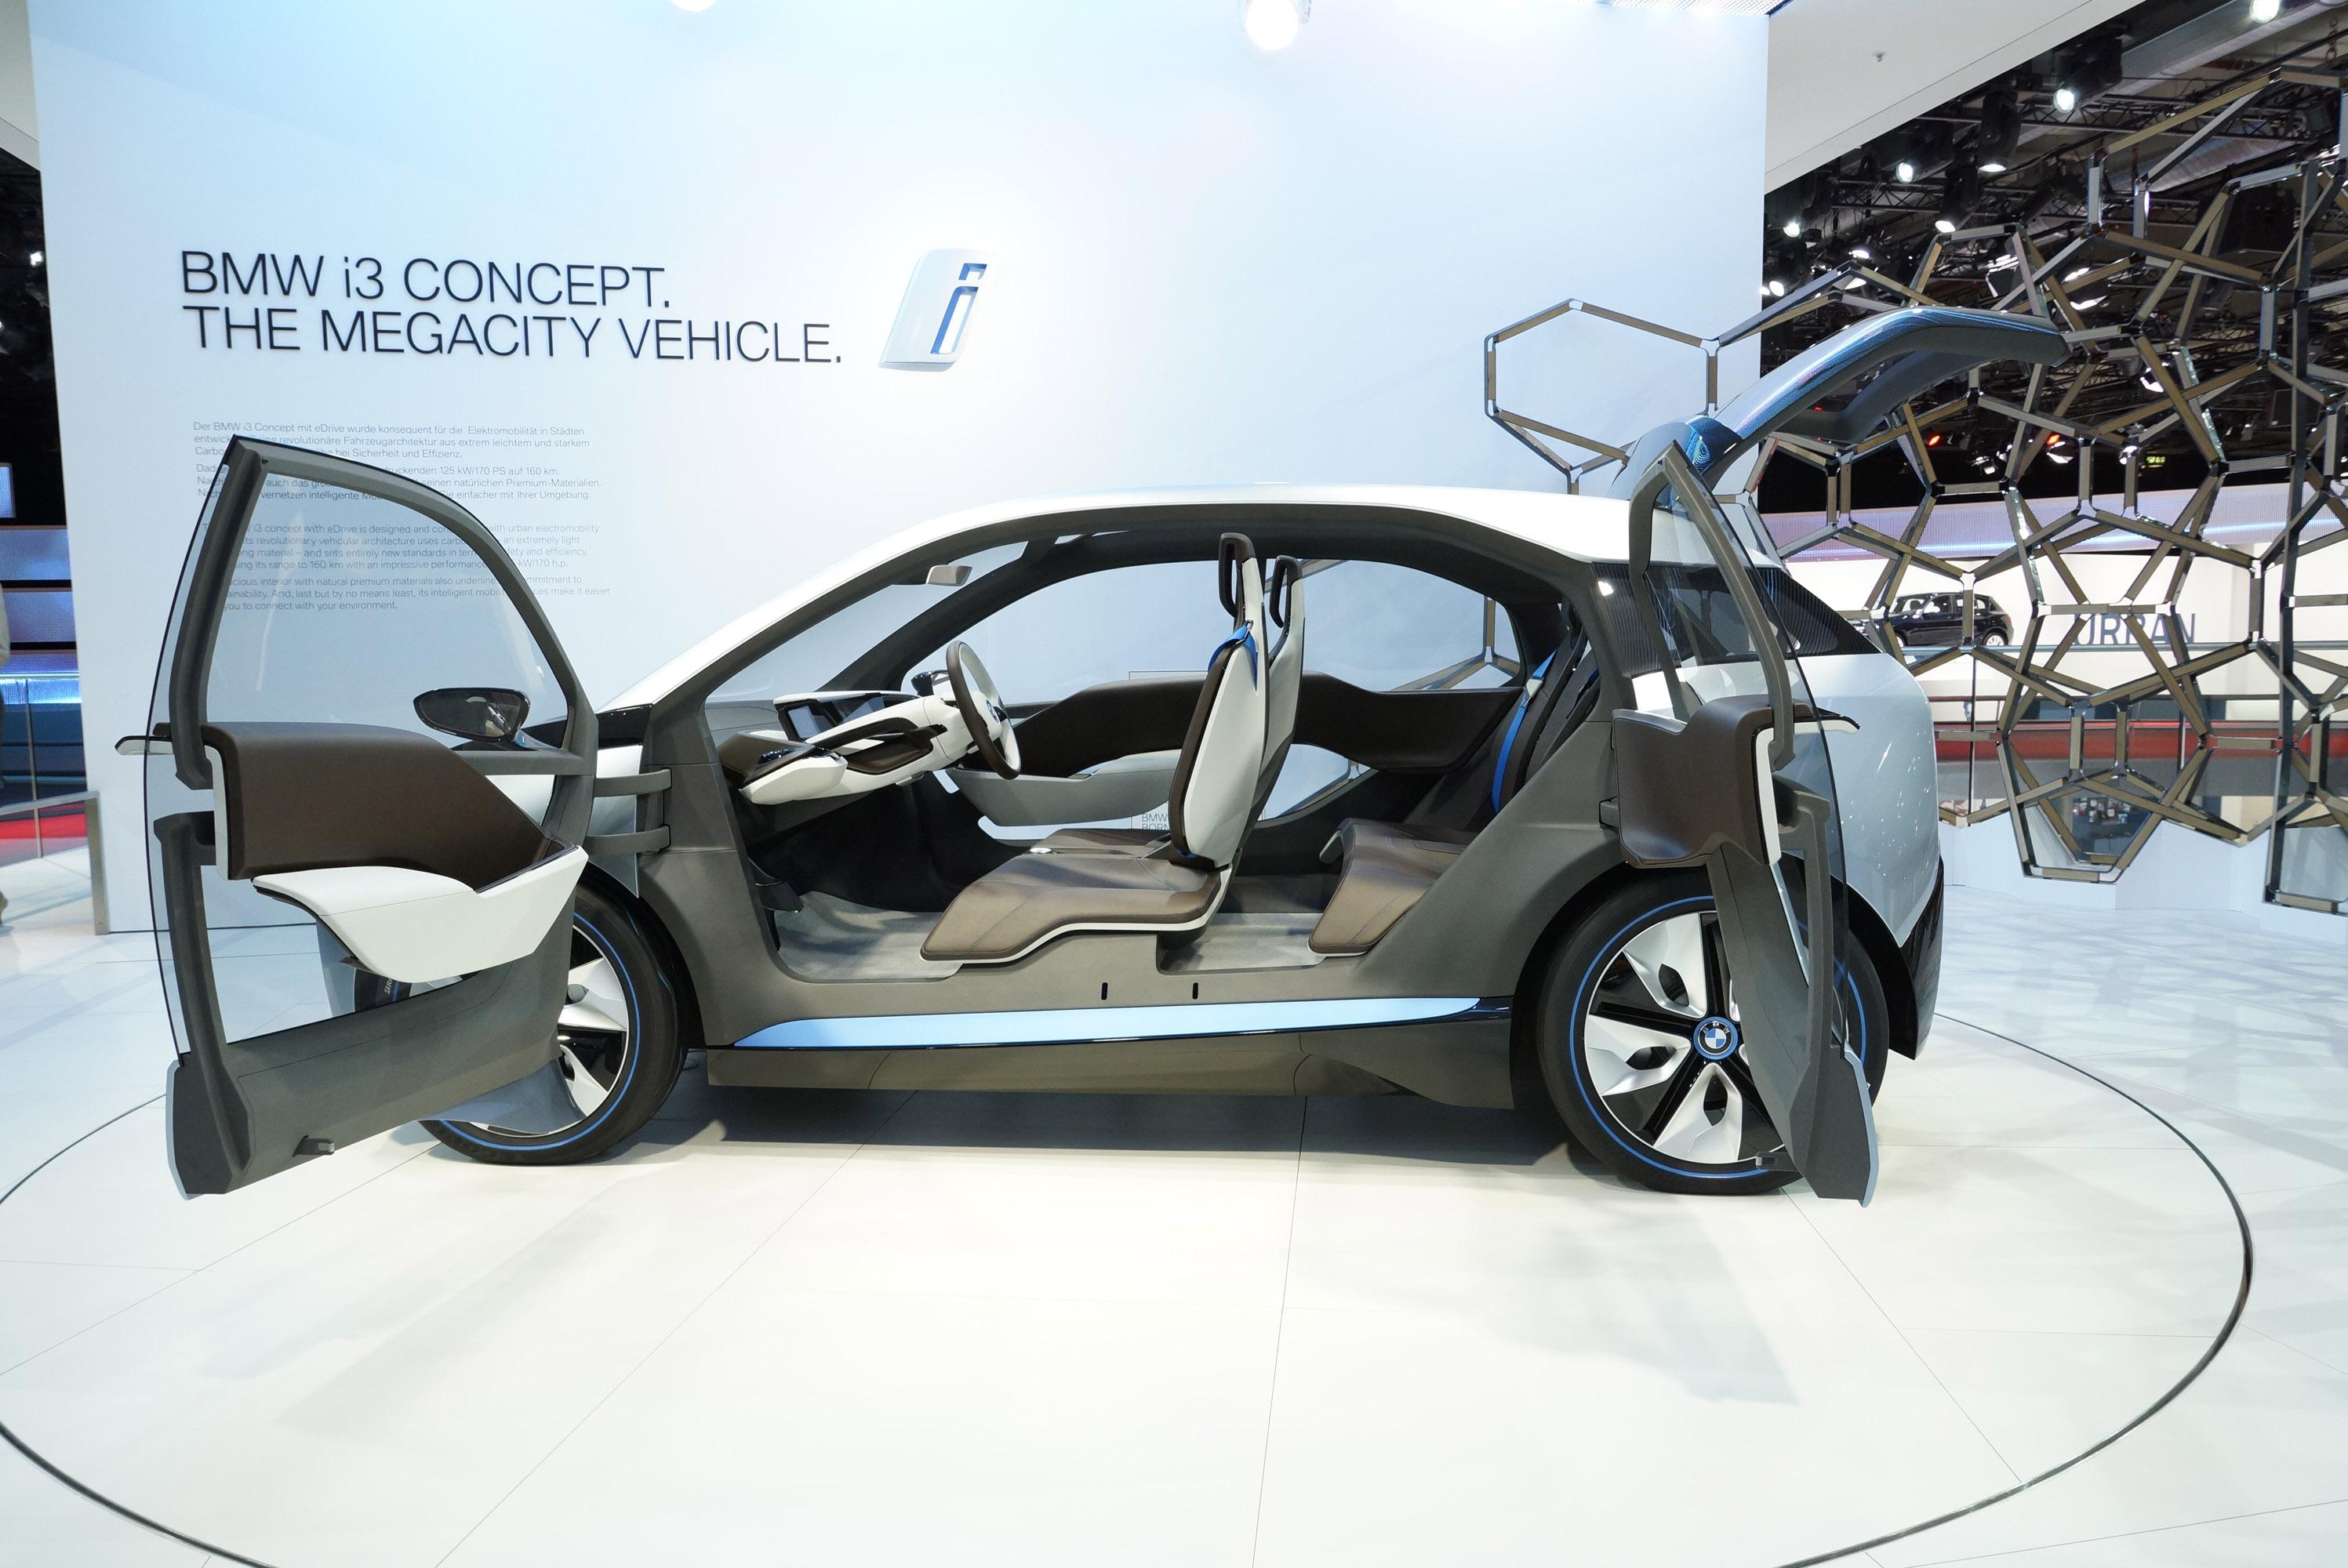 BMW i3 Concept Frankfurt 2011 - Picture 58573